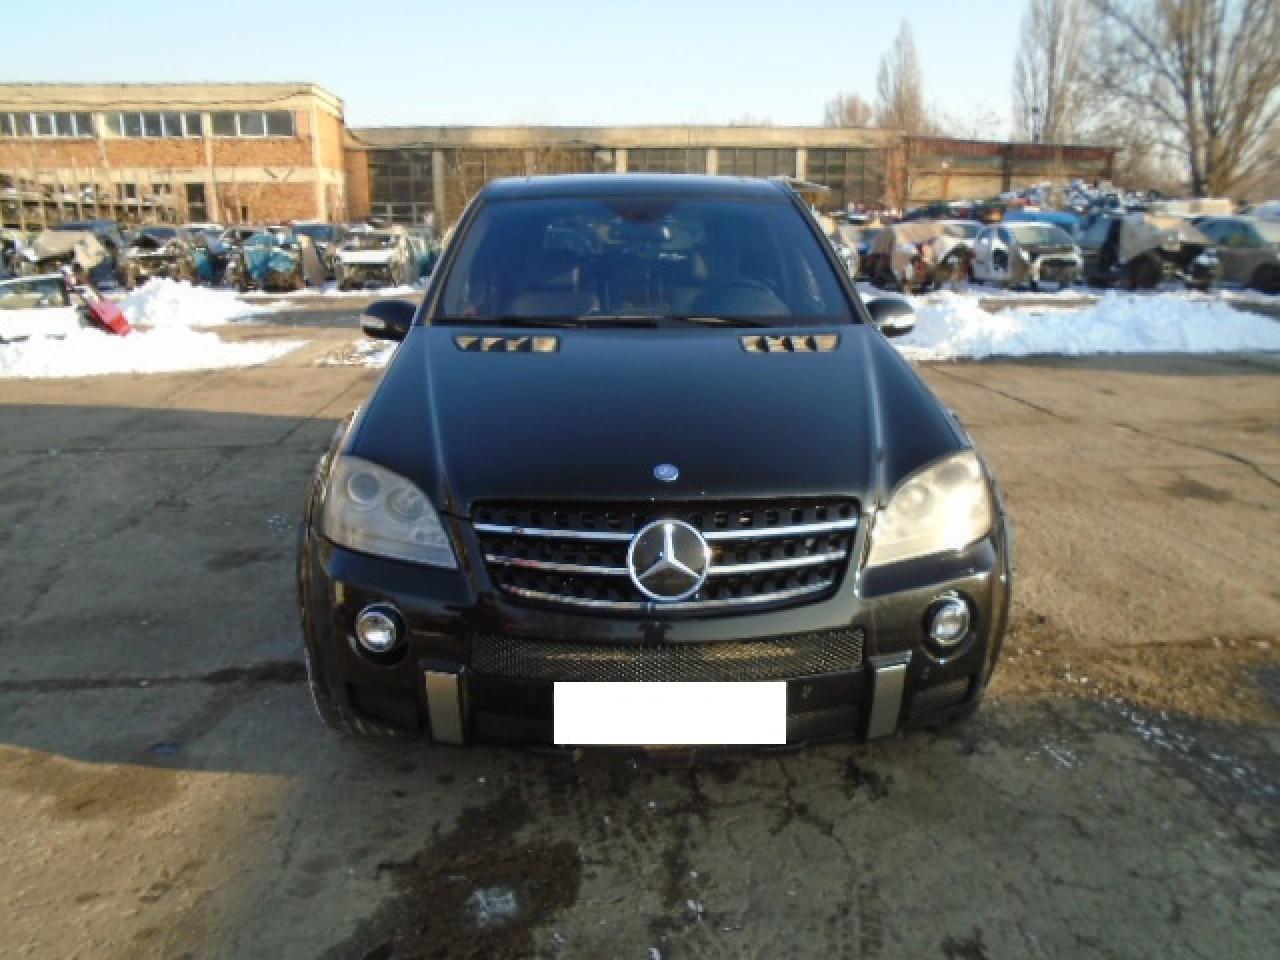 Fata Completa Mercedes Ml W164 420 cdi AMG